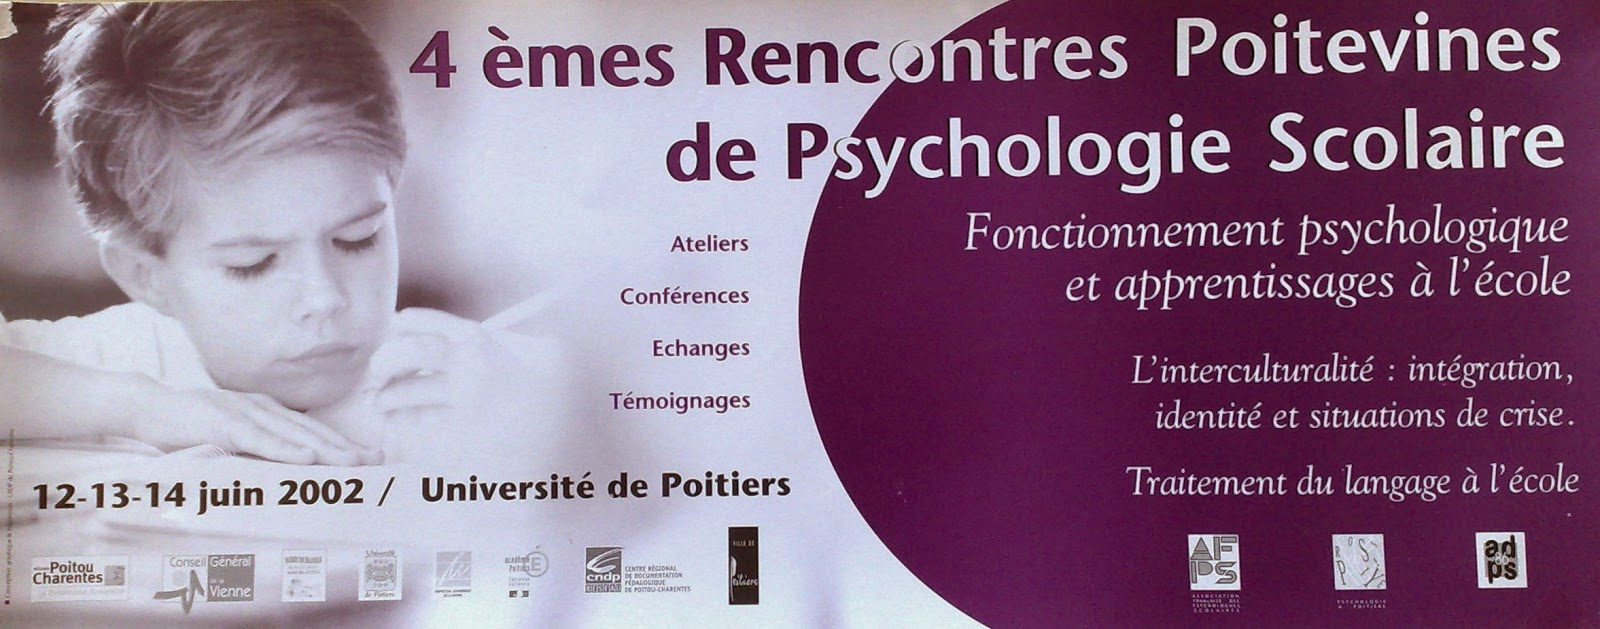 Rencontres poitevines psychologie scolaire 2016